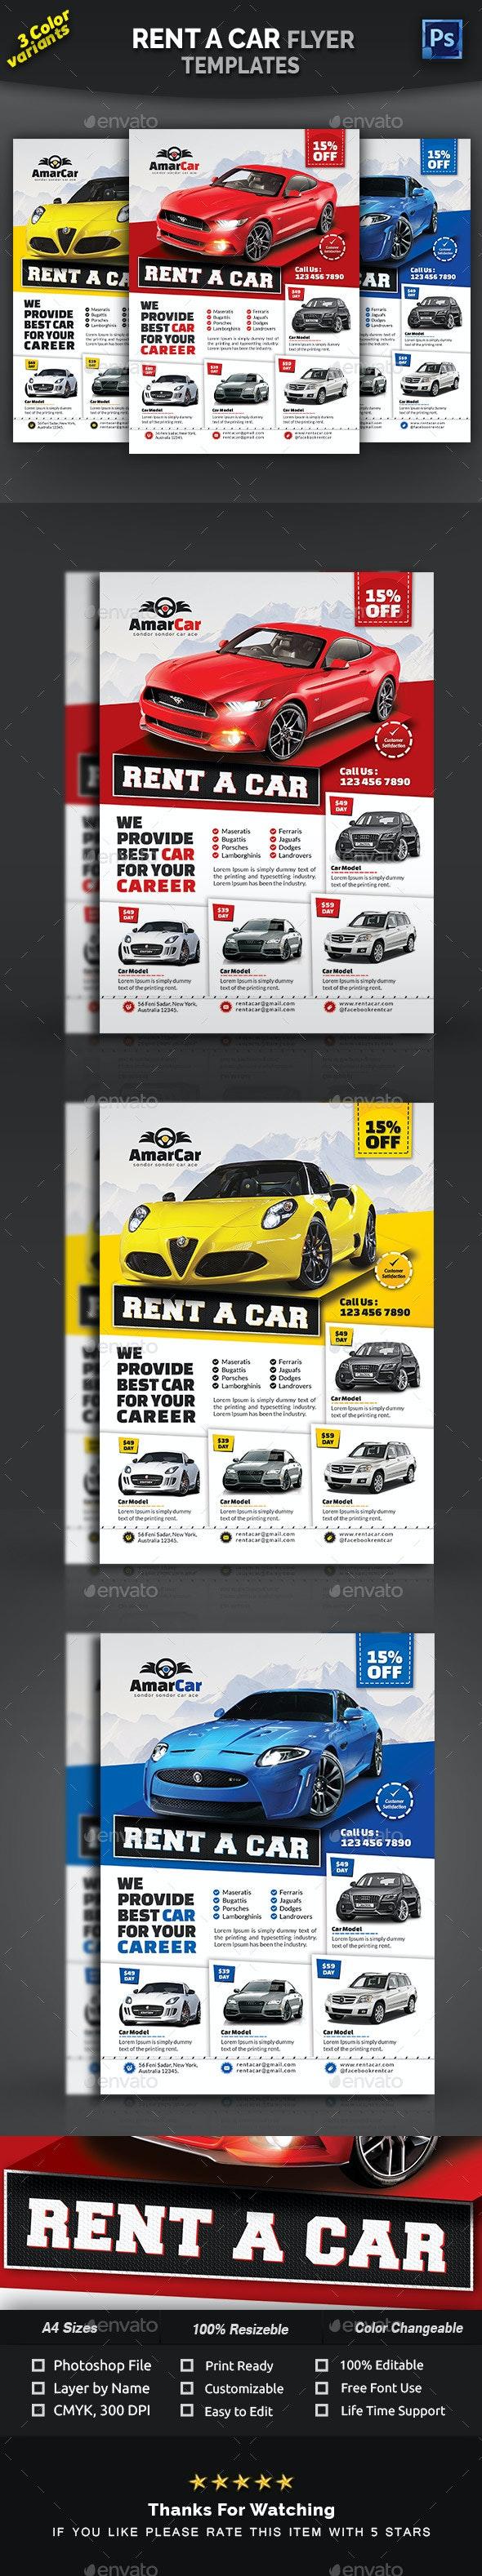 Rent a Car Flyer Templates - Commerce Flyers